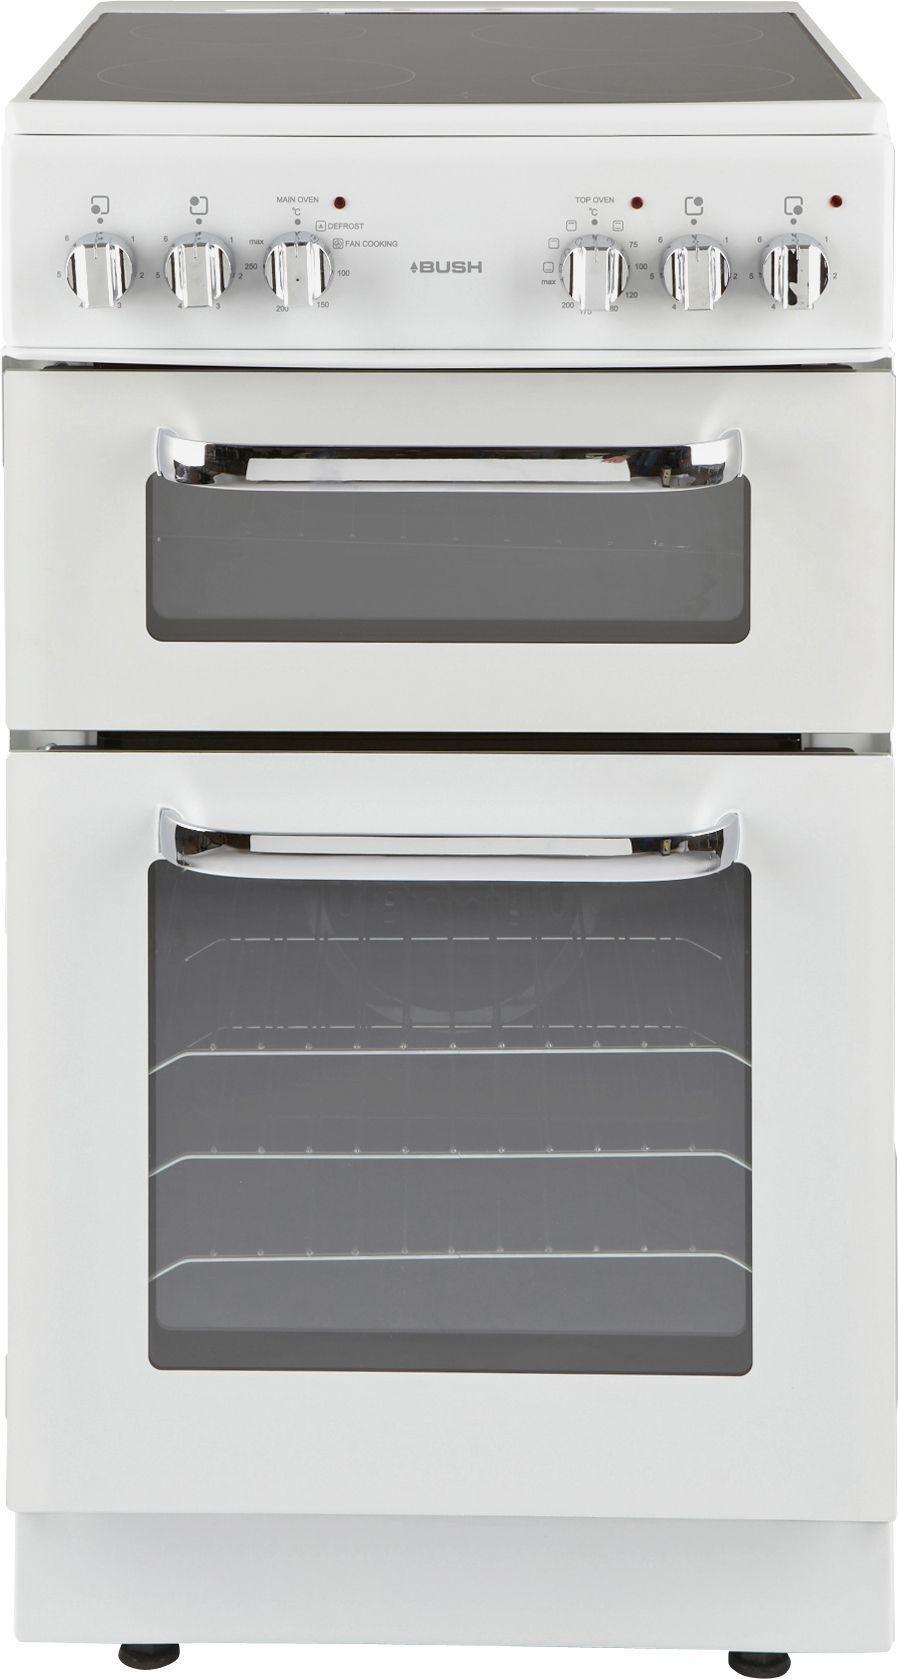 Bush - BFEDC50W Double Electric Cooker - White/Ins/Del/Rec